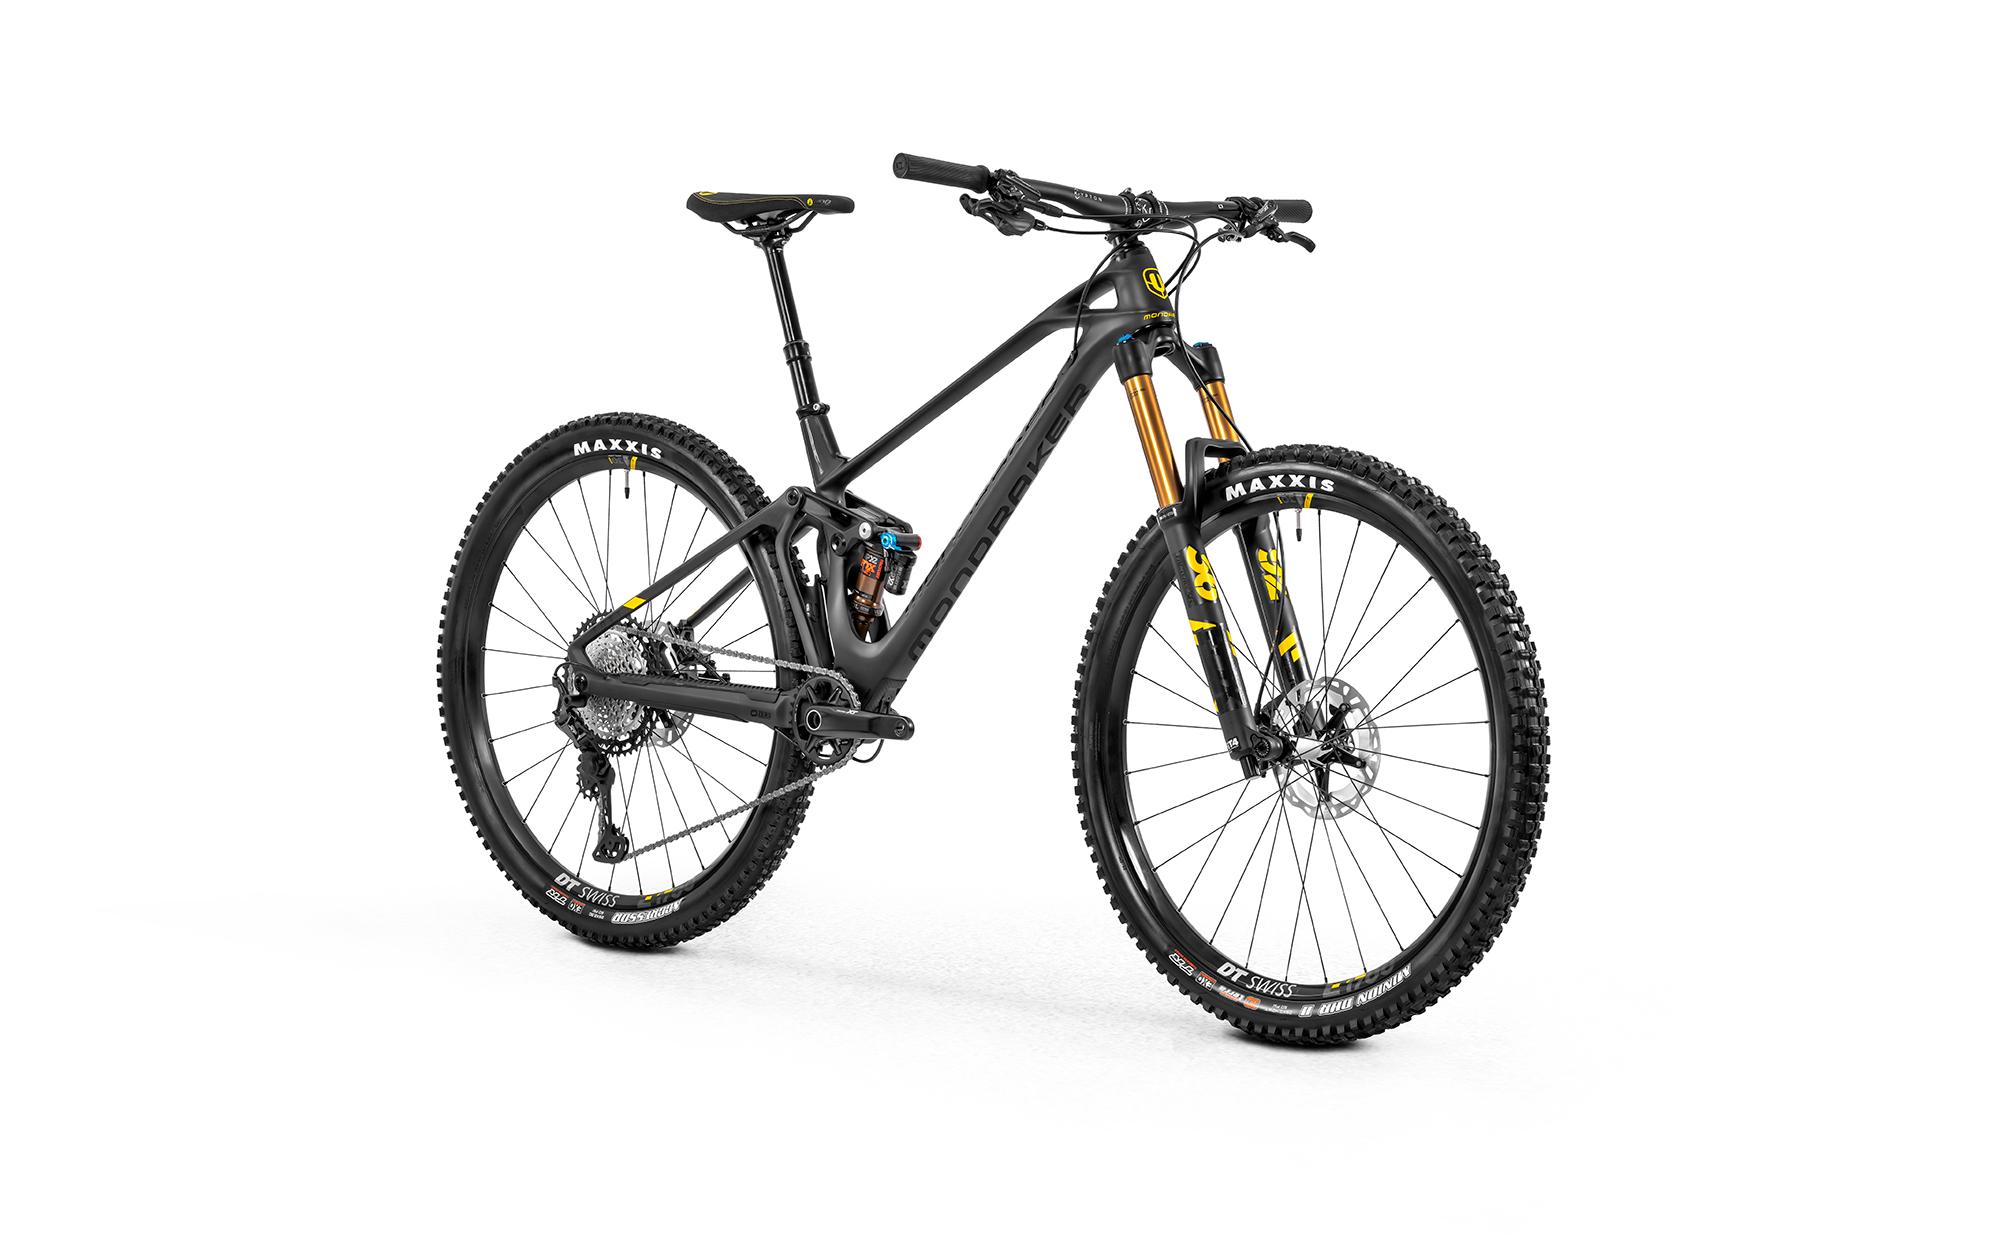 Foxy Carbon RR 29, black phantom/yellow, 2020